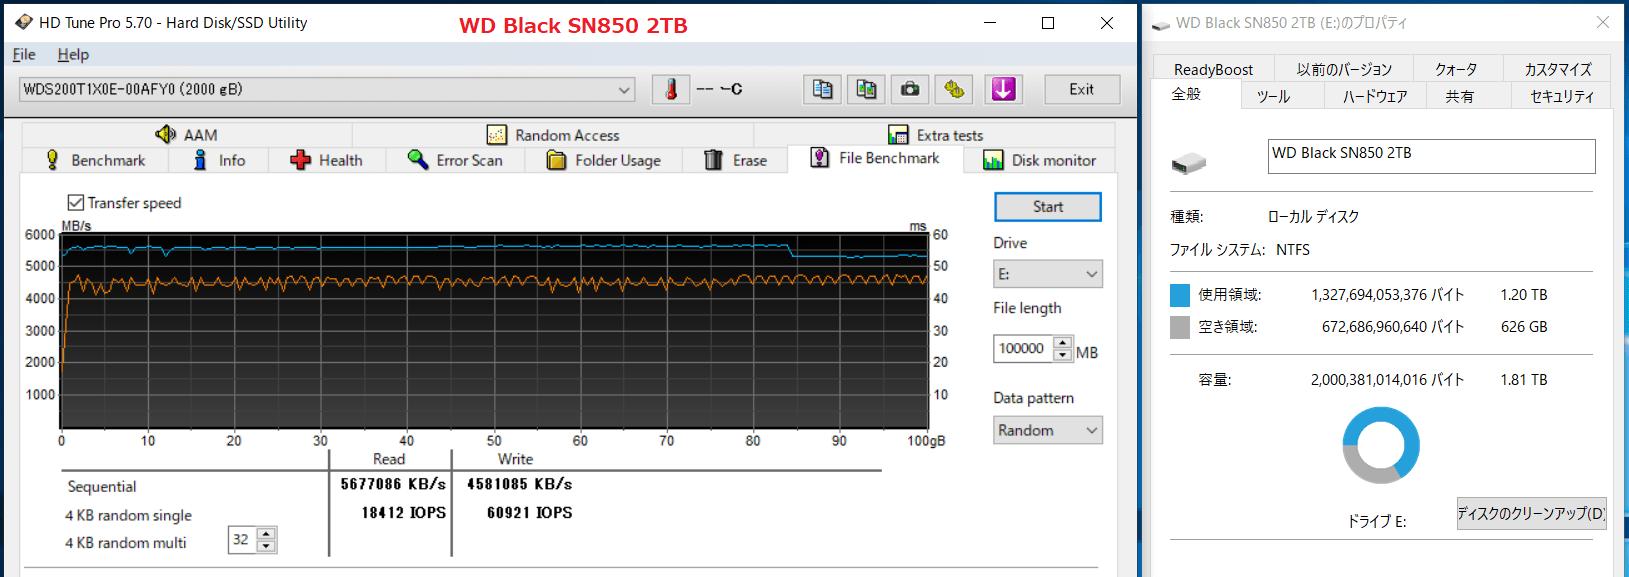 WD Black SN850 2TB_SLC-Cache_600GB-Free